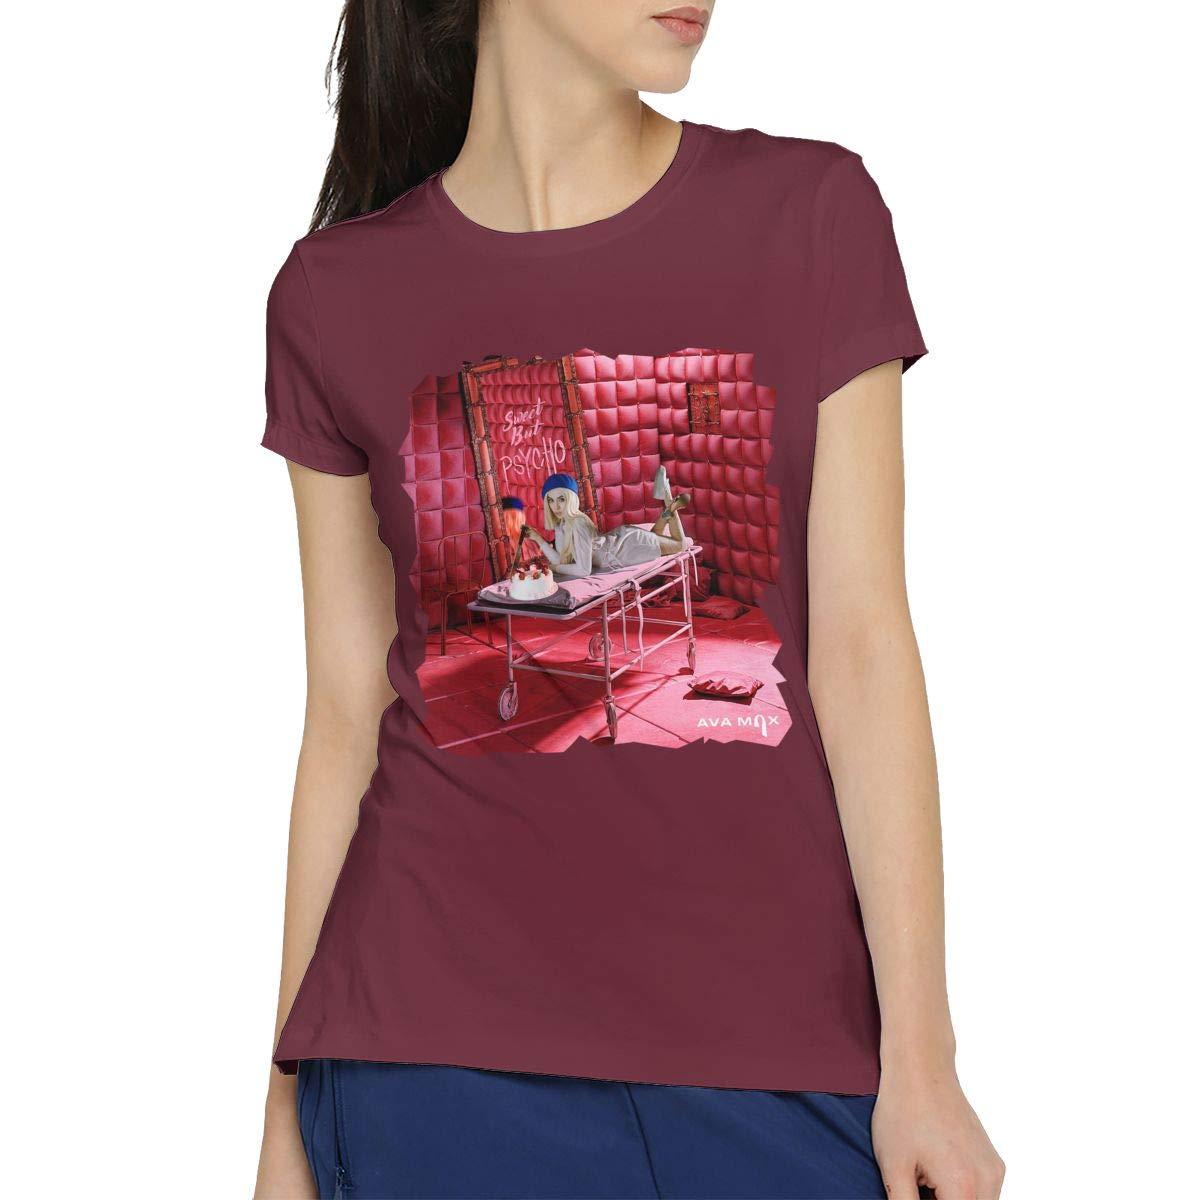 Chunt Ava Max Sweet But Psycho Short Sleeve S Burgundy 4903 Shirts